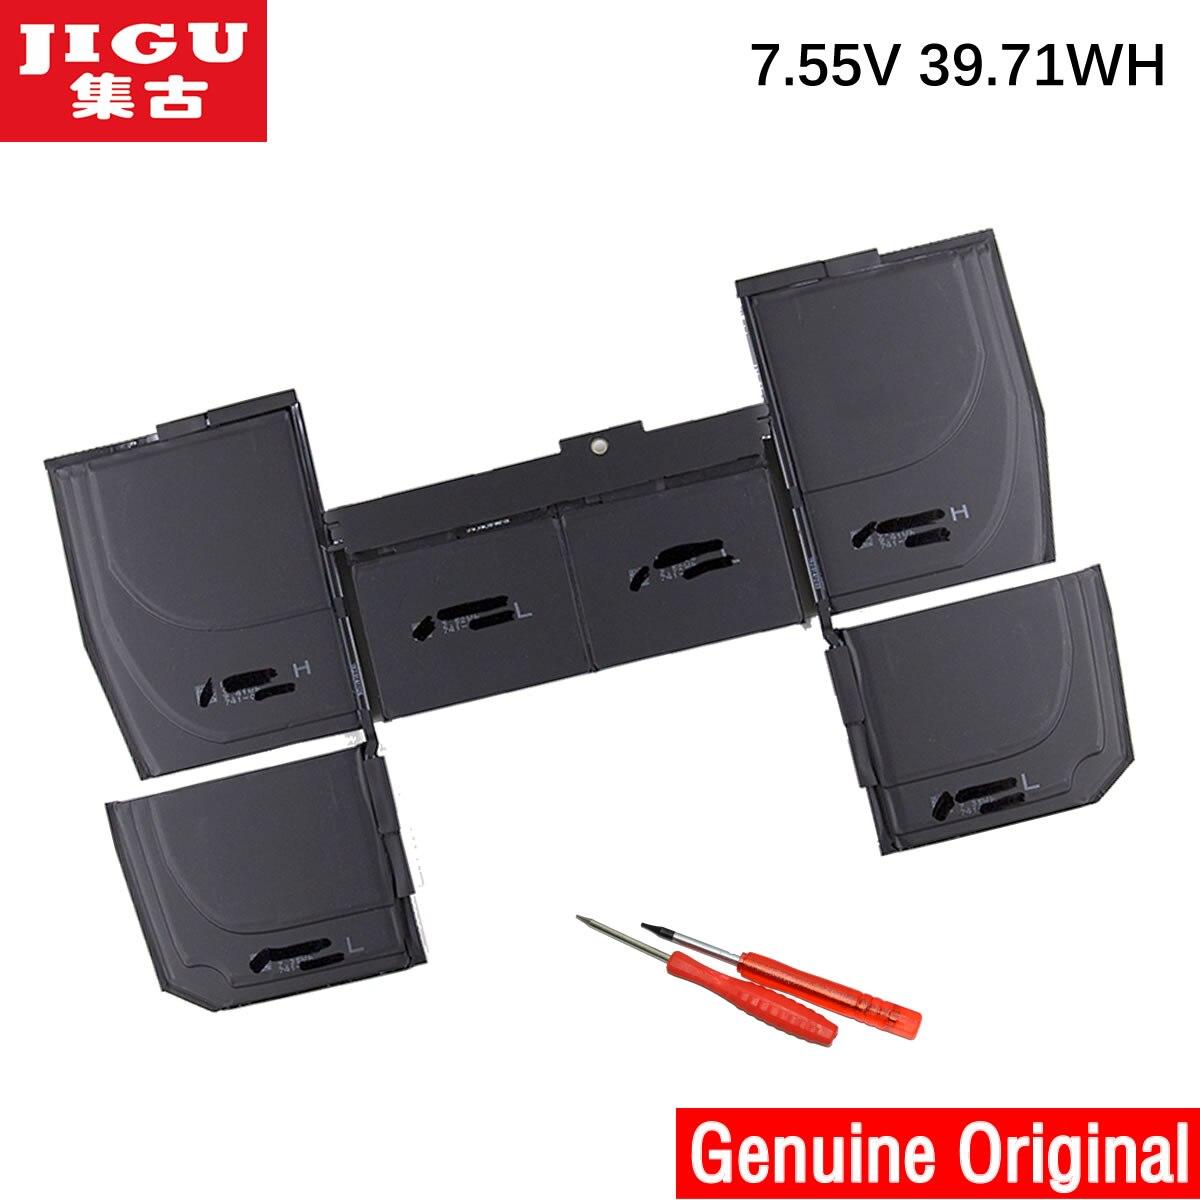 все цены на JIGU A1527 New Original Laptop battery For APPLE MacBook 12